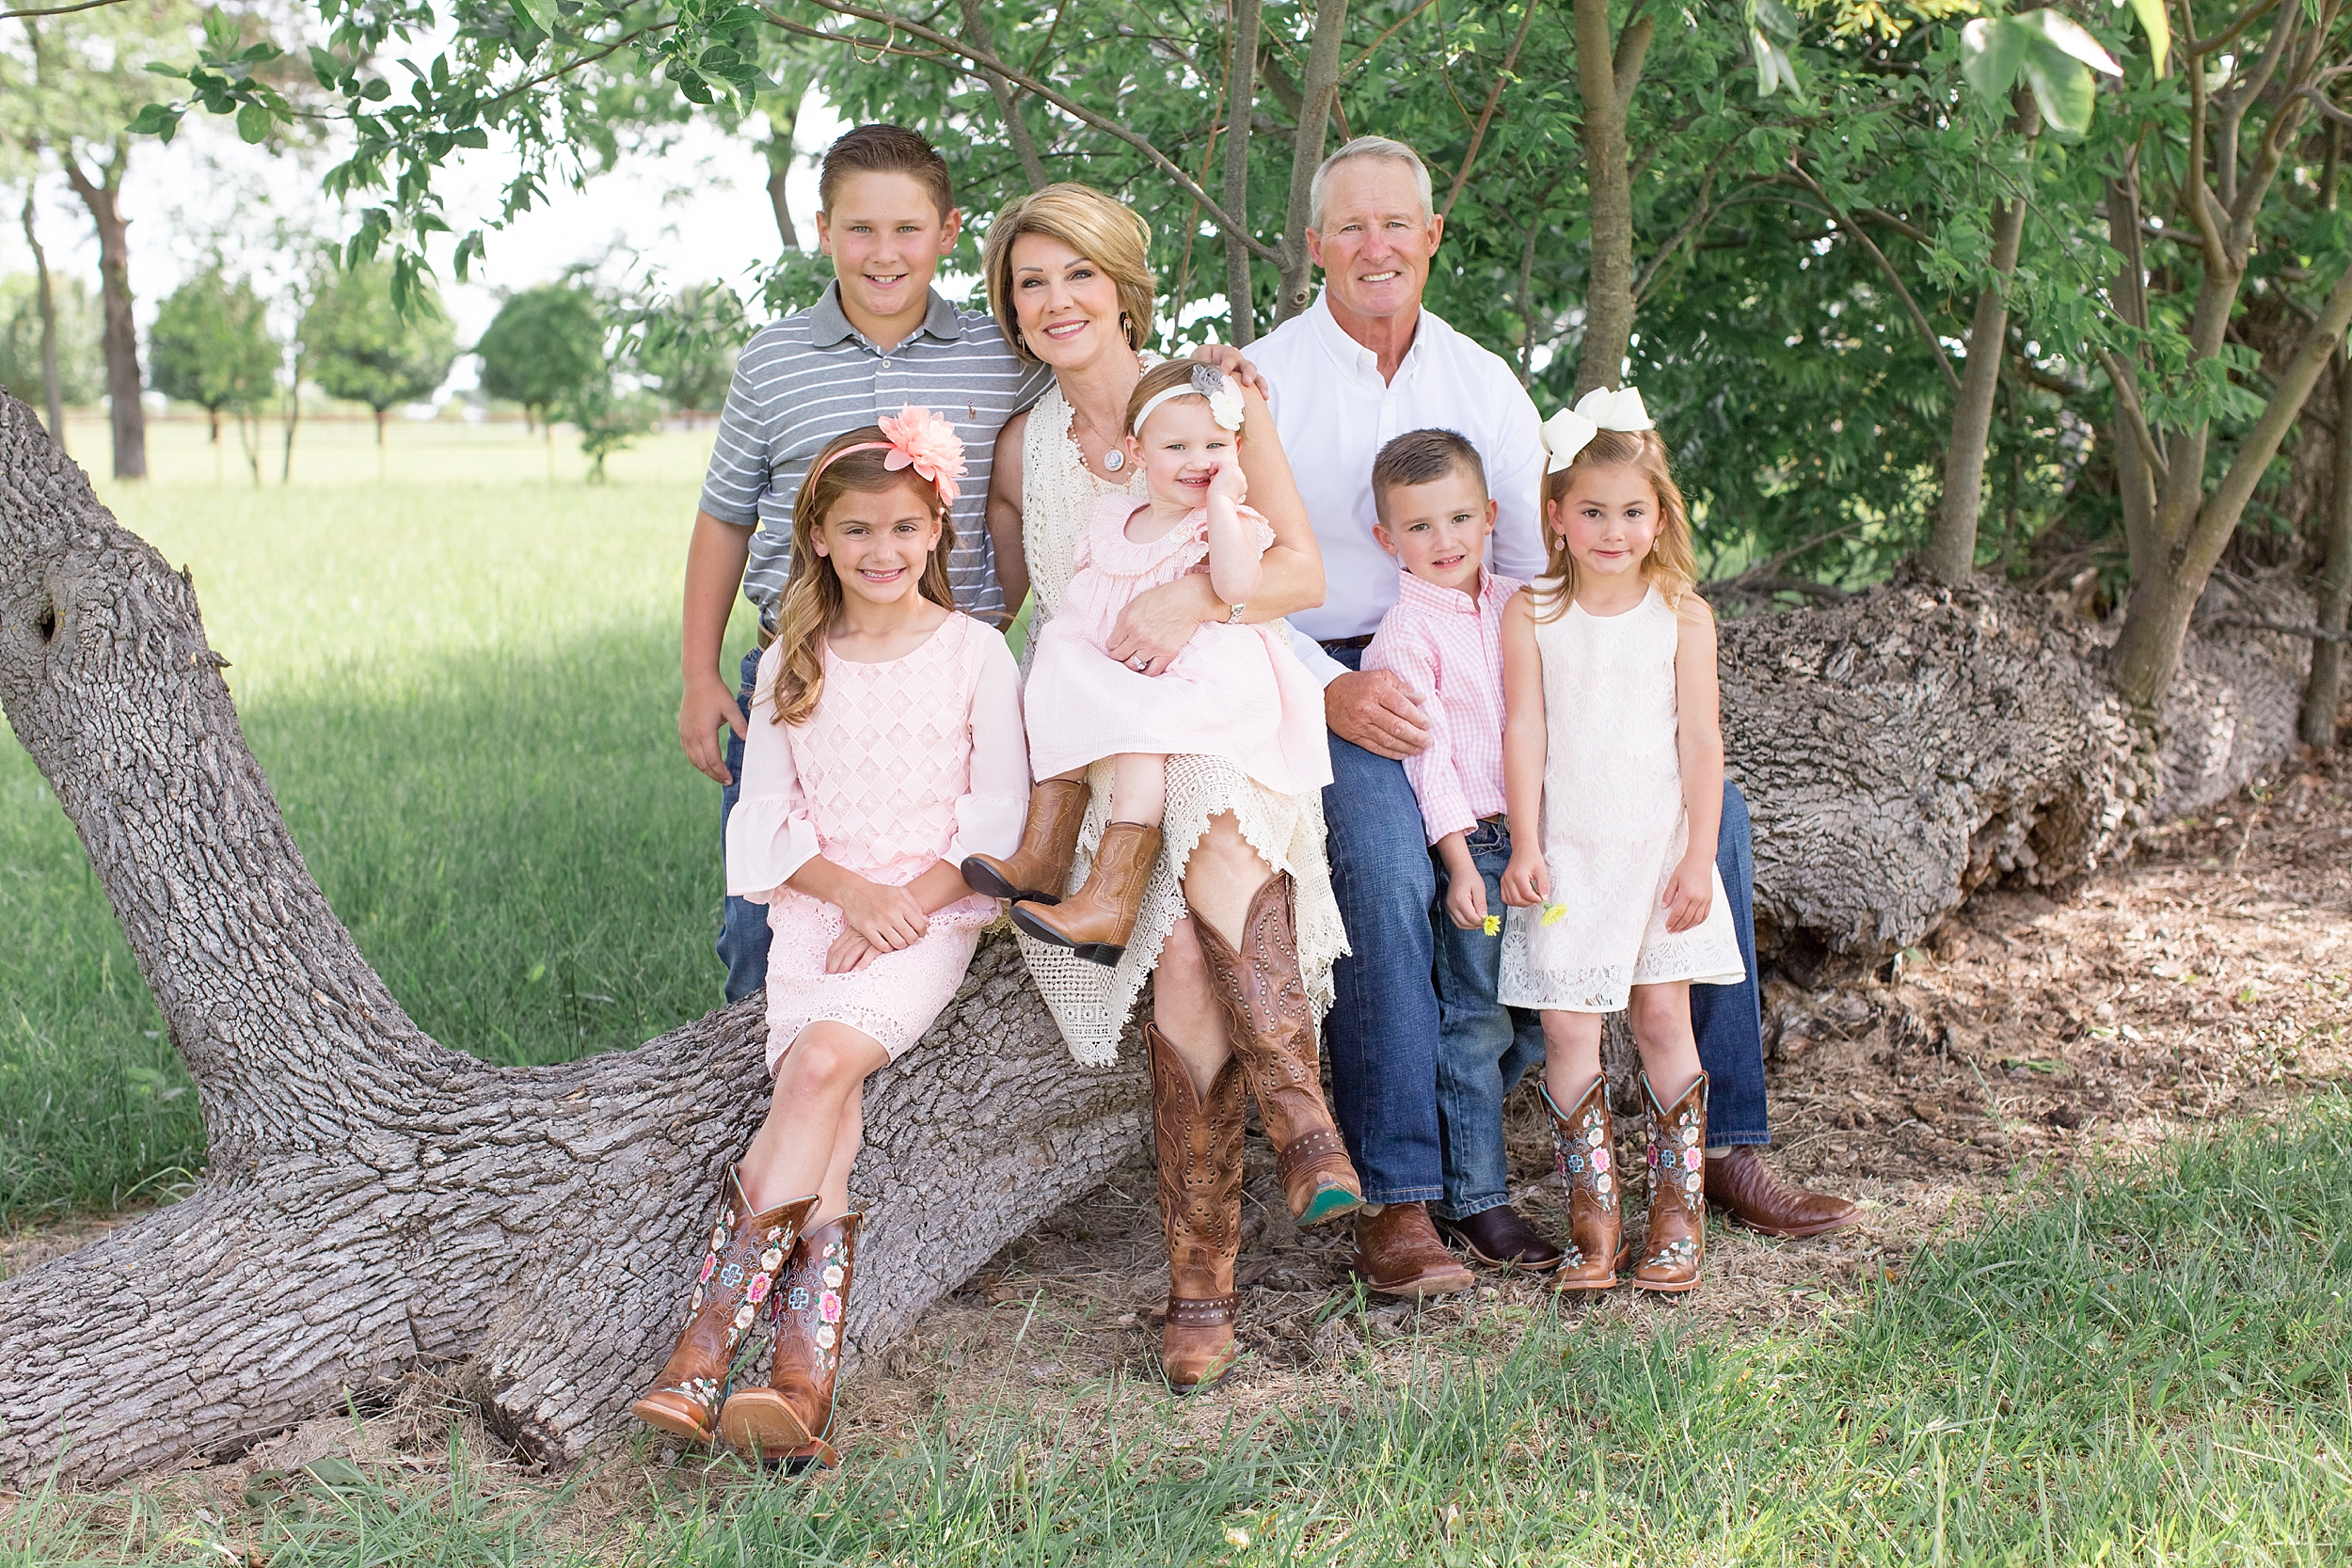 Landon-Schneider-Photography-Family-Session-Texas_0004.jpg